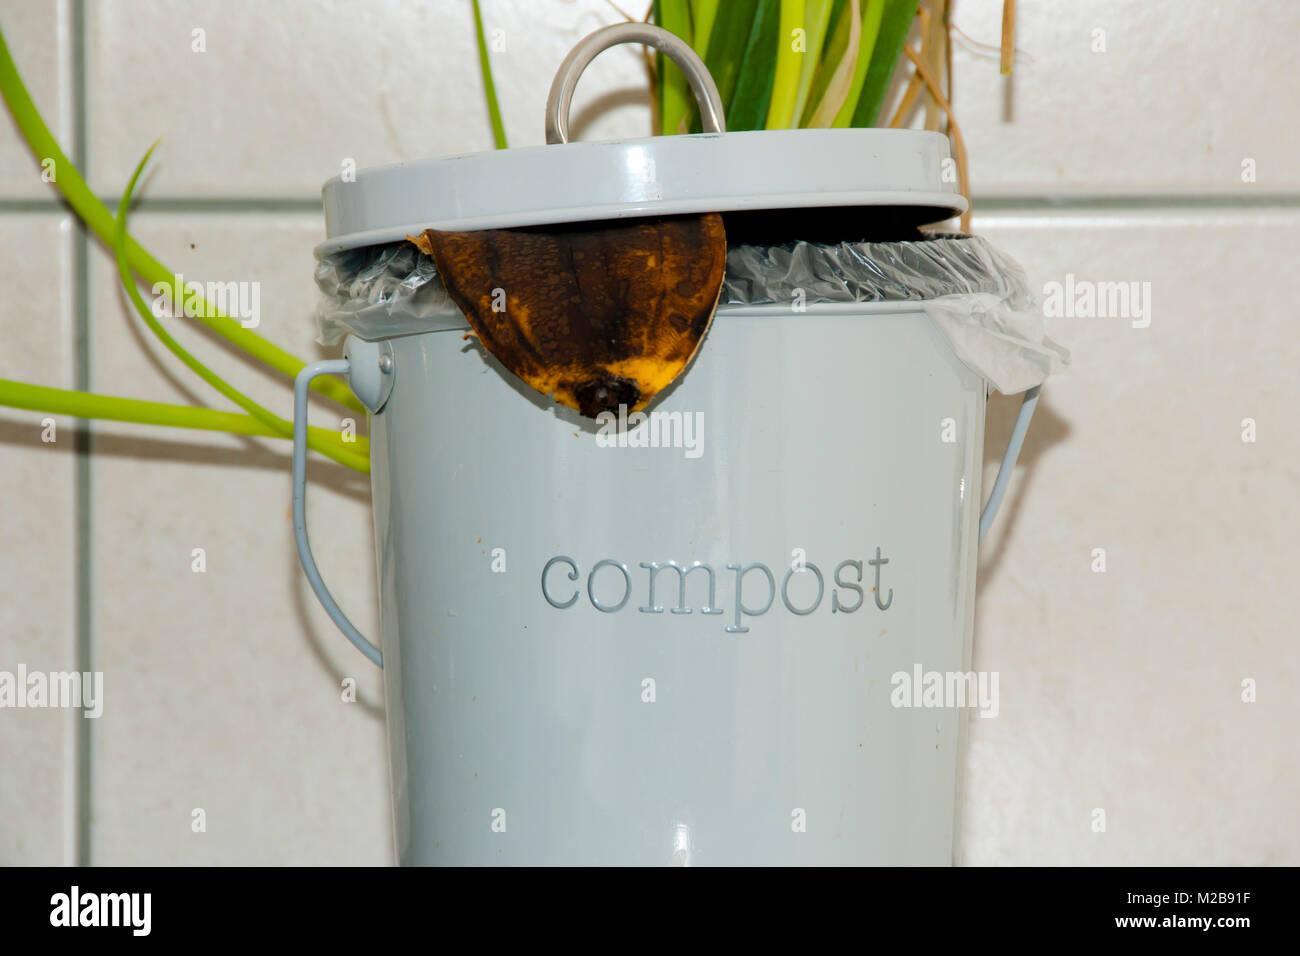 Organic Waste Kitchen Stock Photos & Organic Waste Kitchen Stock ...